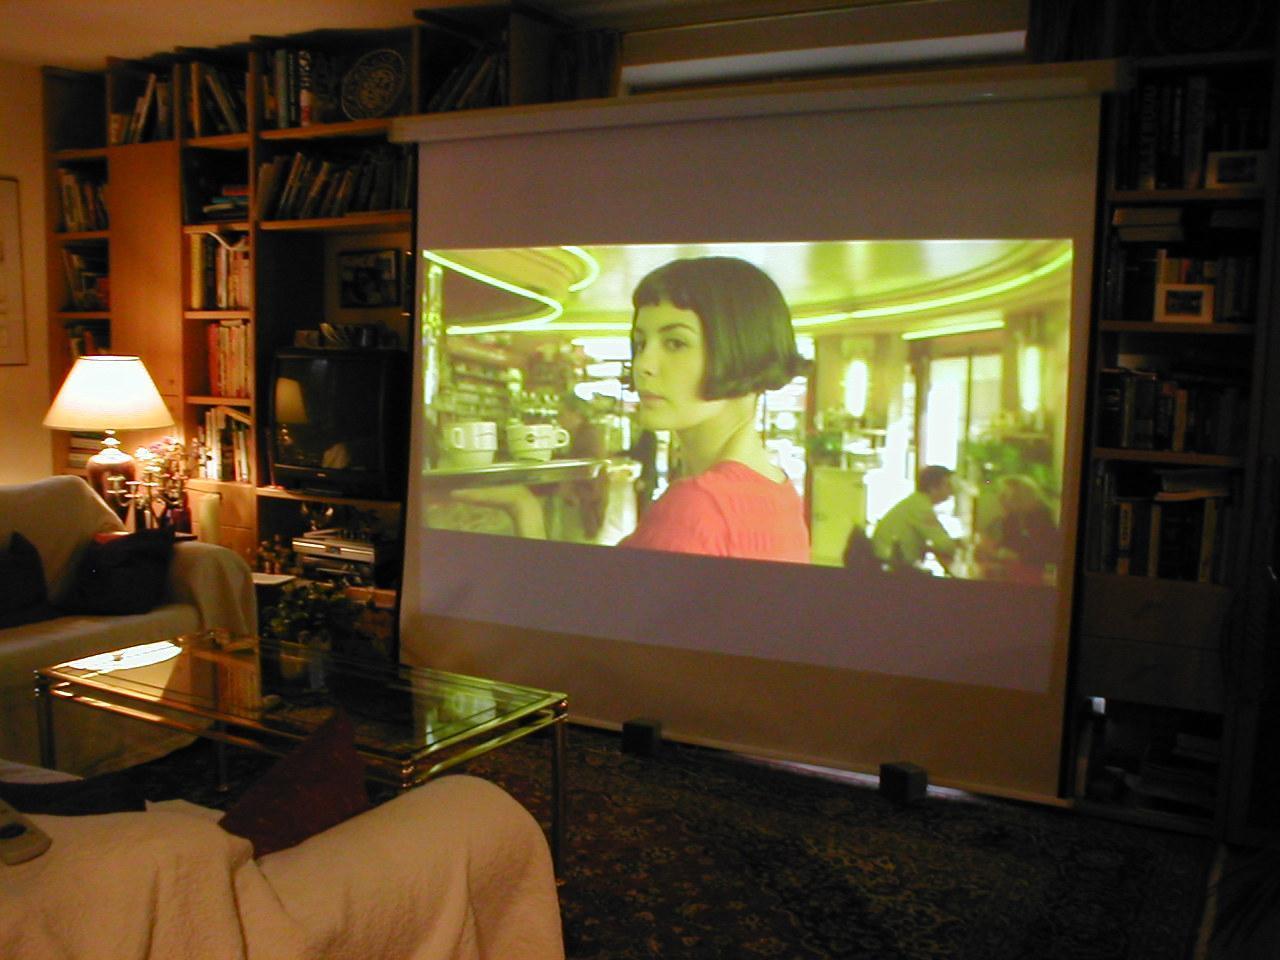 heimkino leinwand beamer motorleinw nde video leinw nde. Black Bedroom Furniture Sets. Home Design Ideas